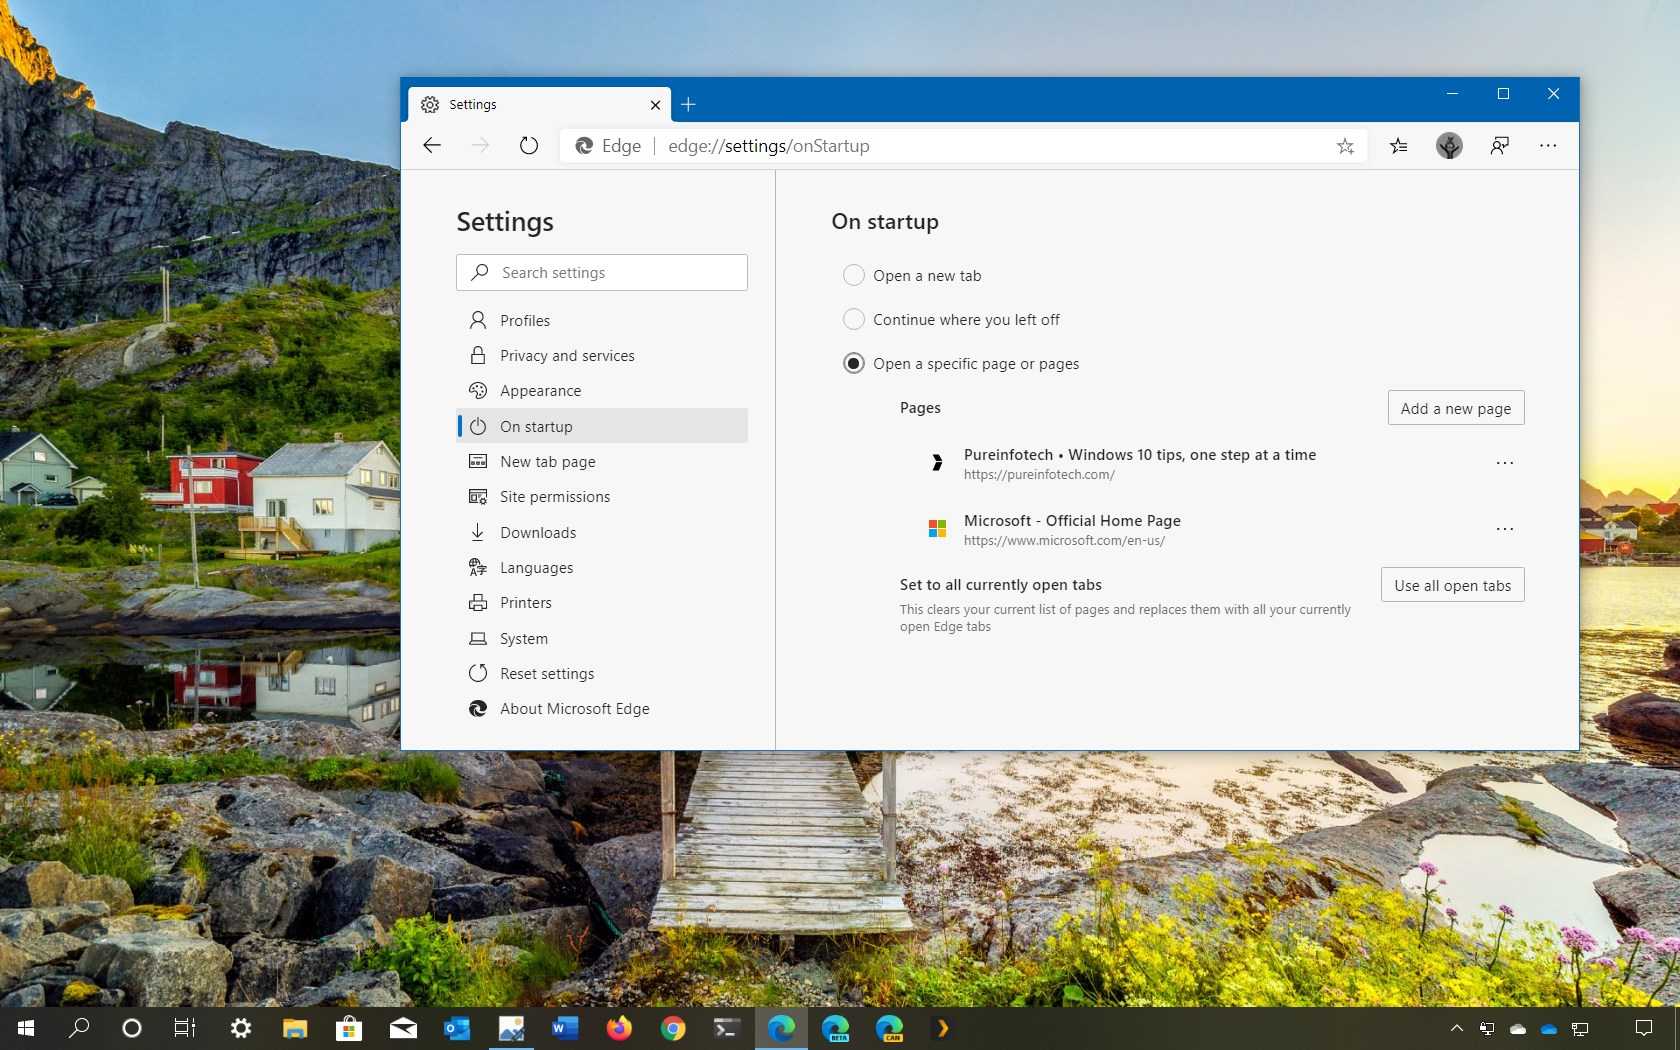 Microsoft Edge on startup settings